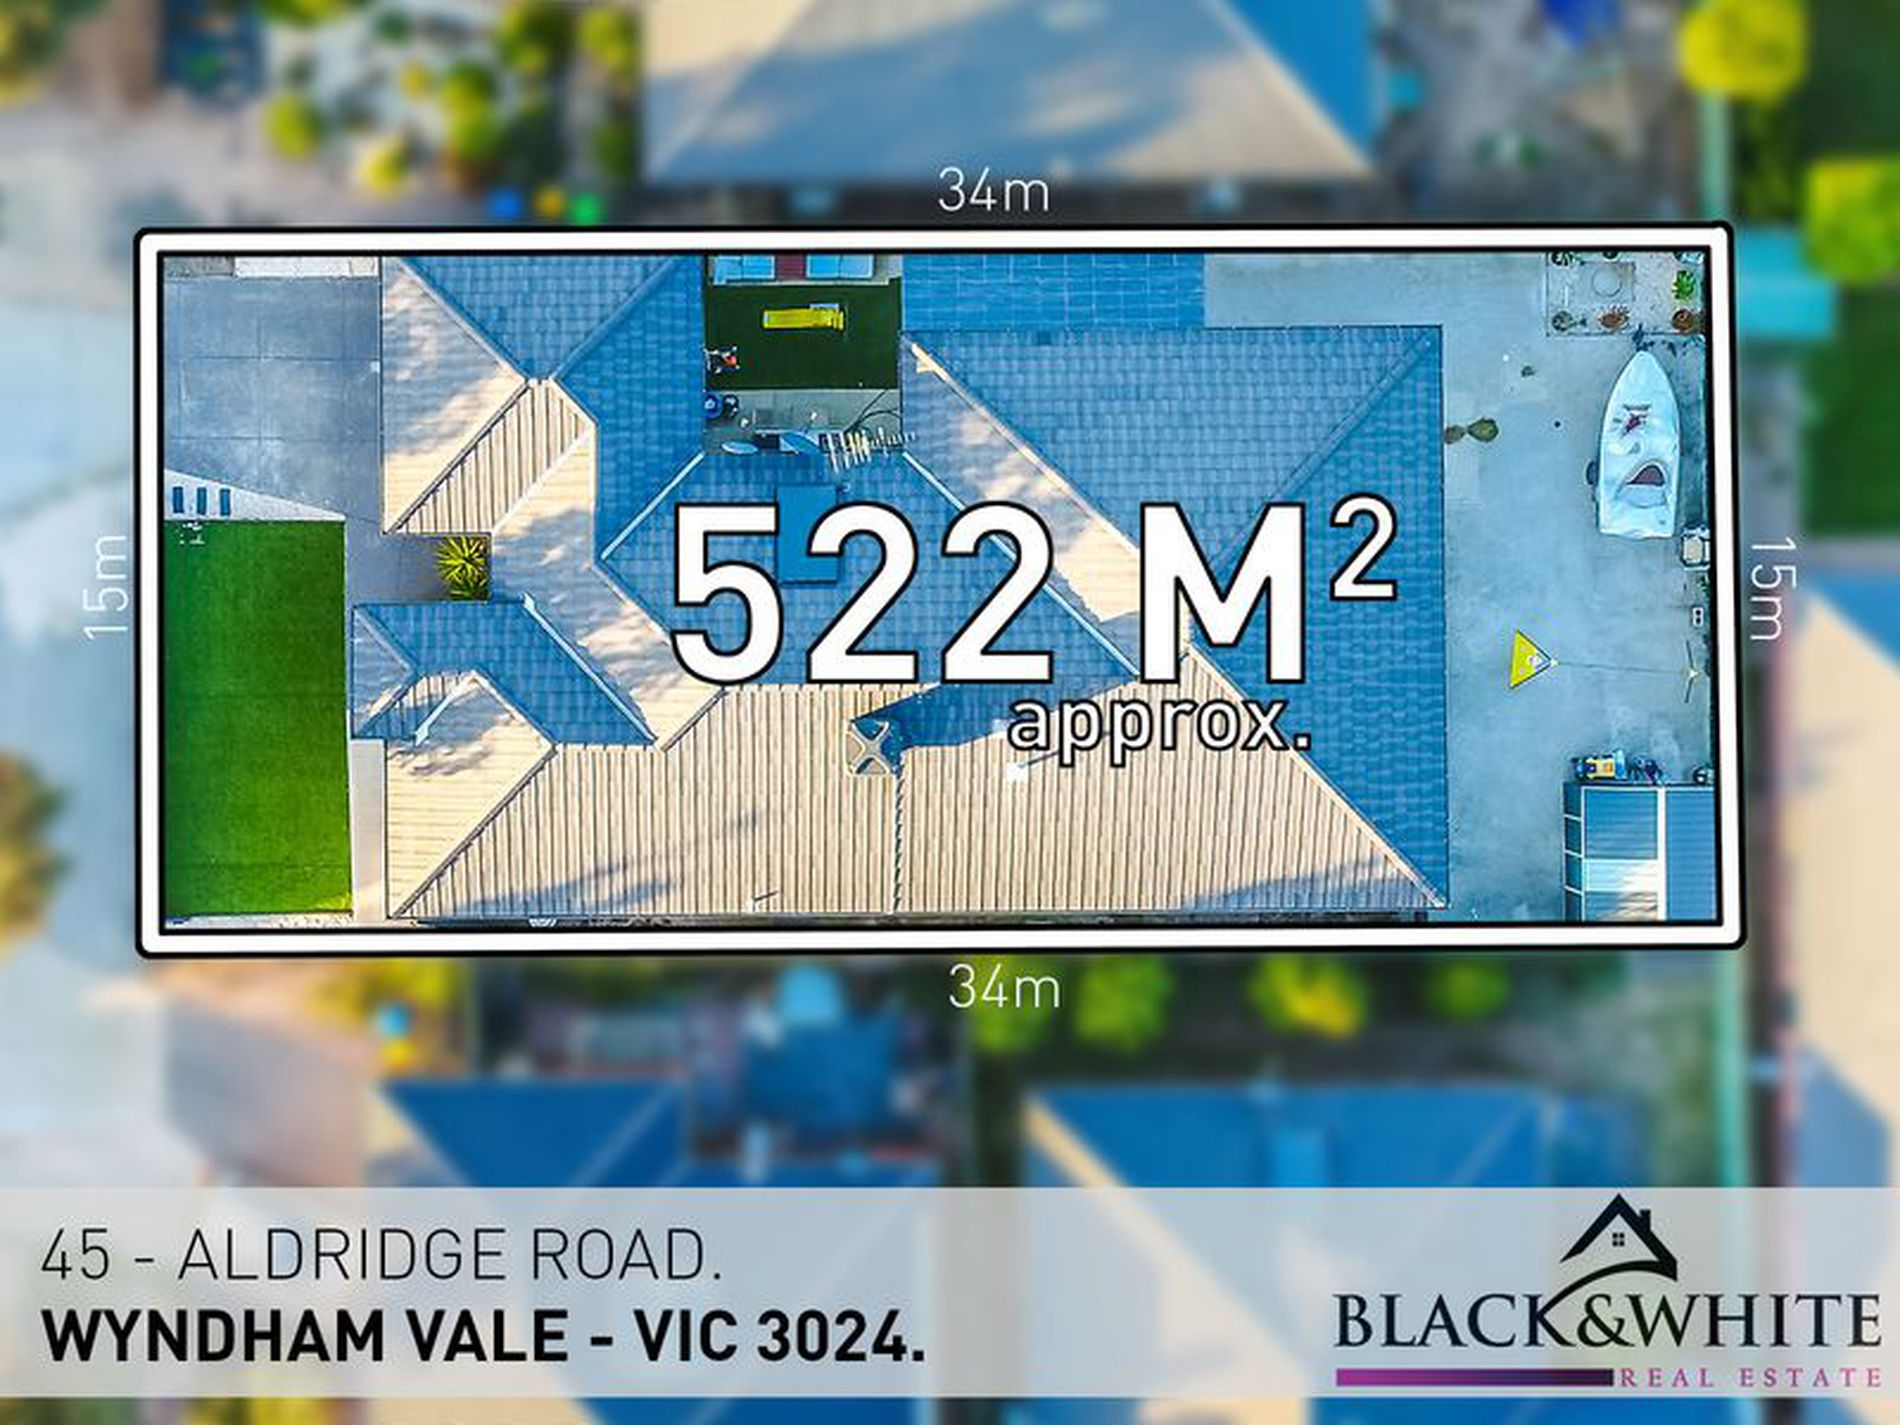 45 Aldridge Road, Wyndham Vale